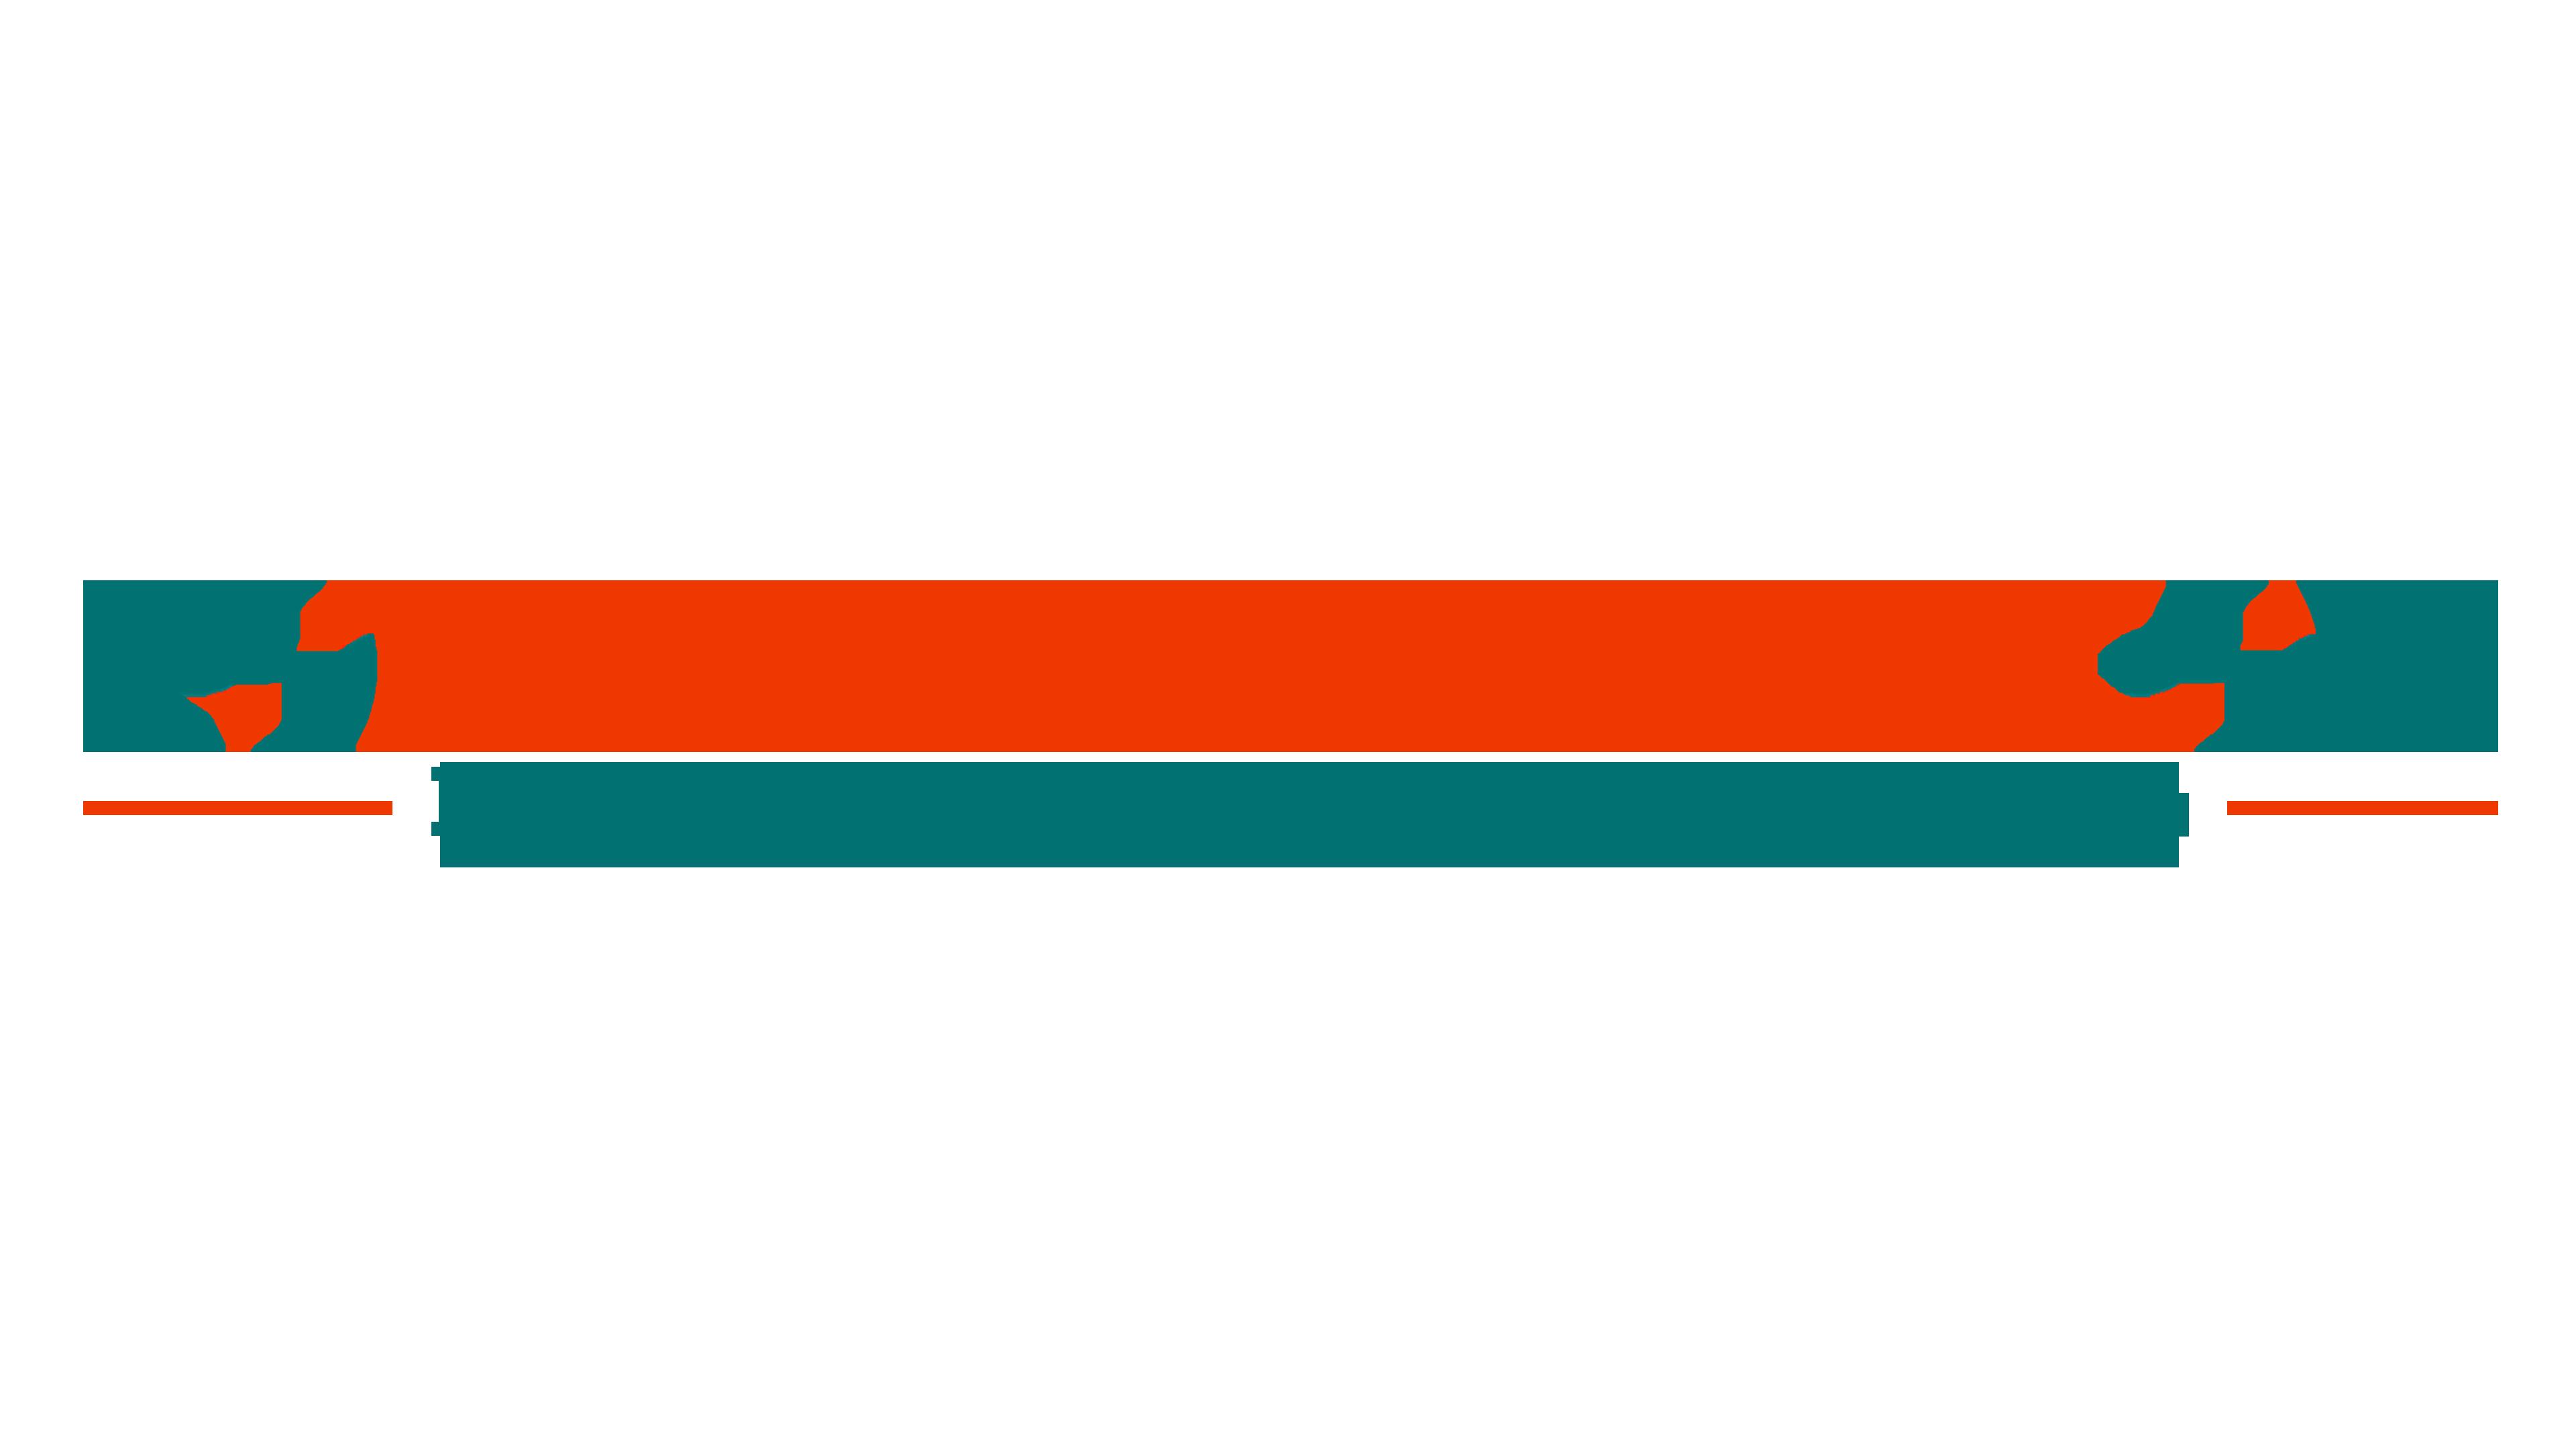 zonaintelektual.com